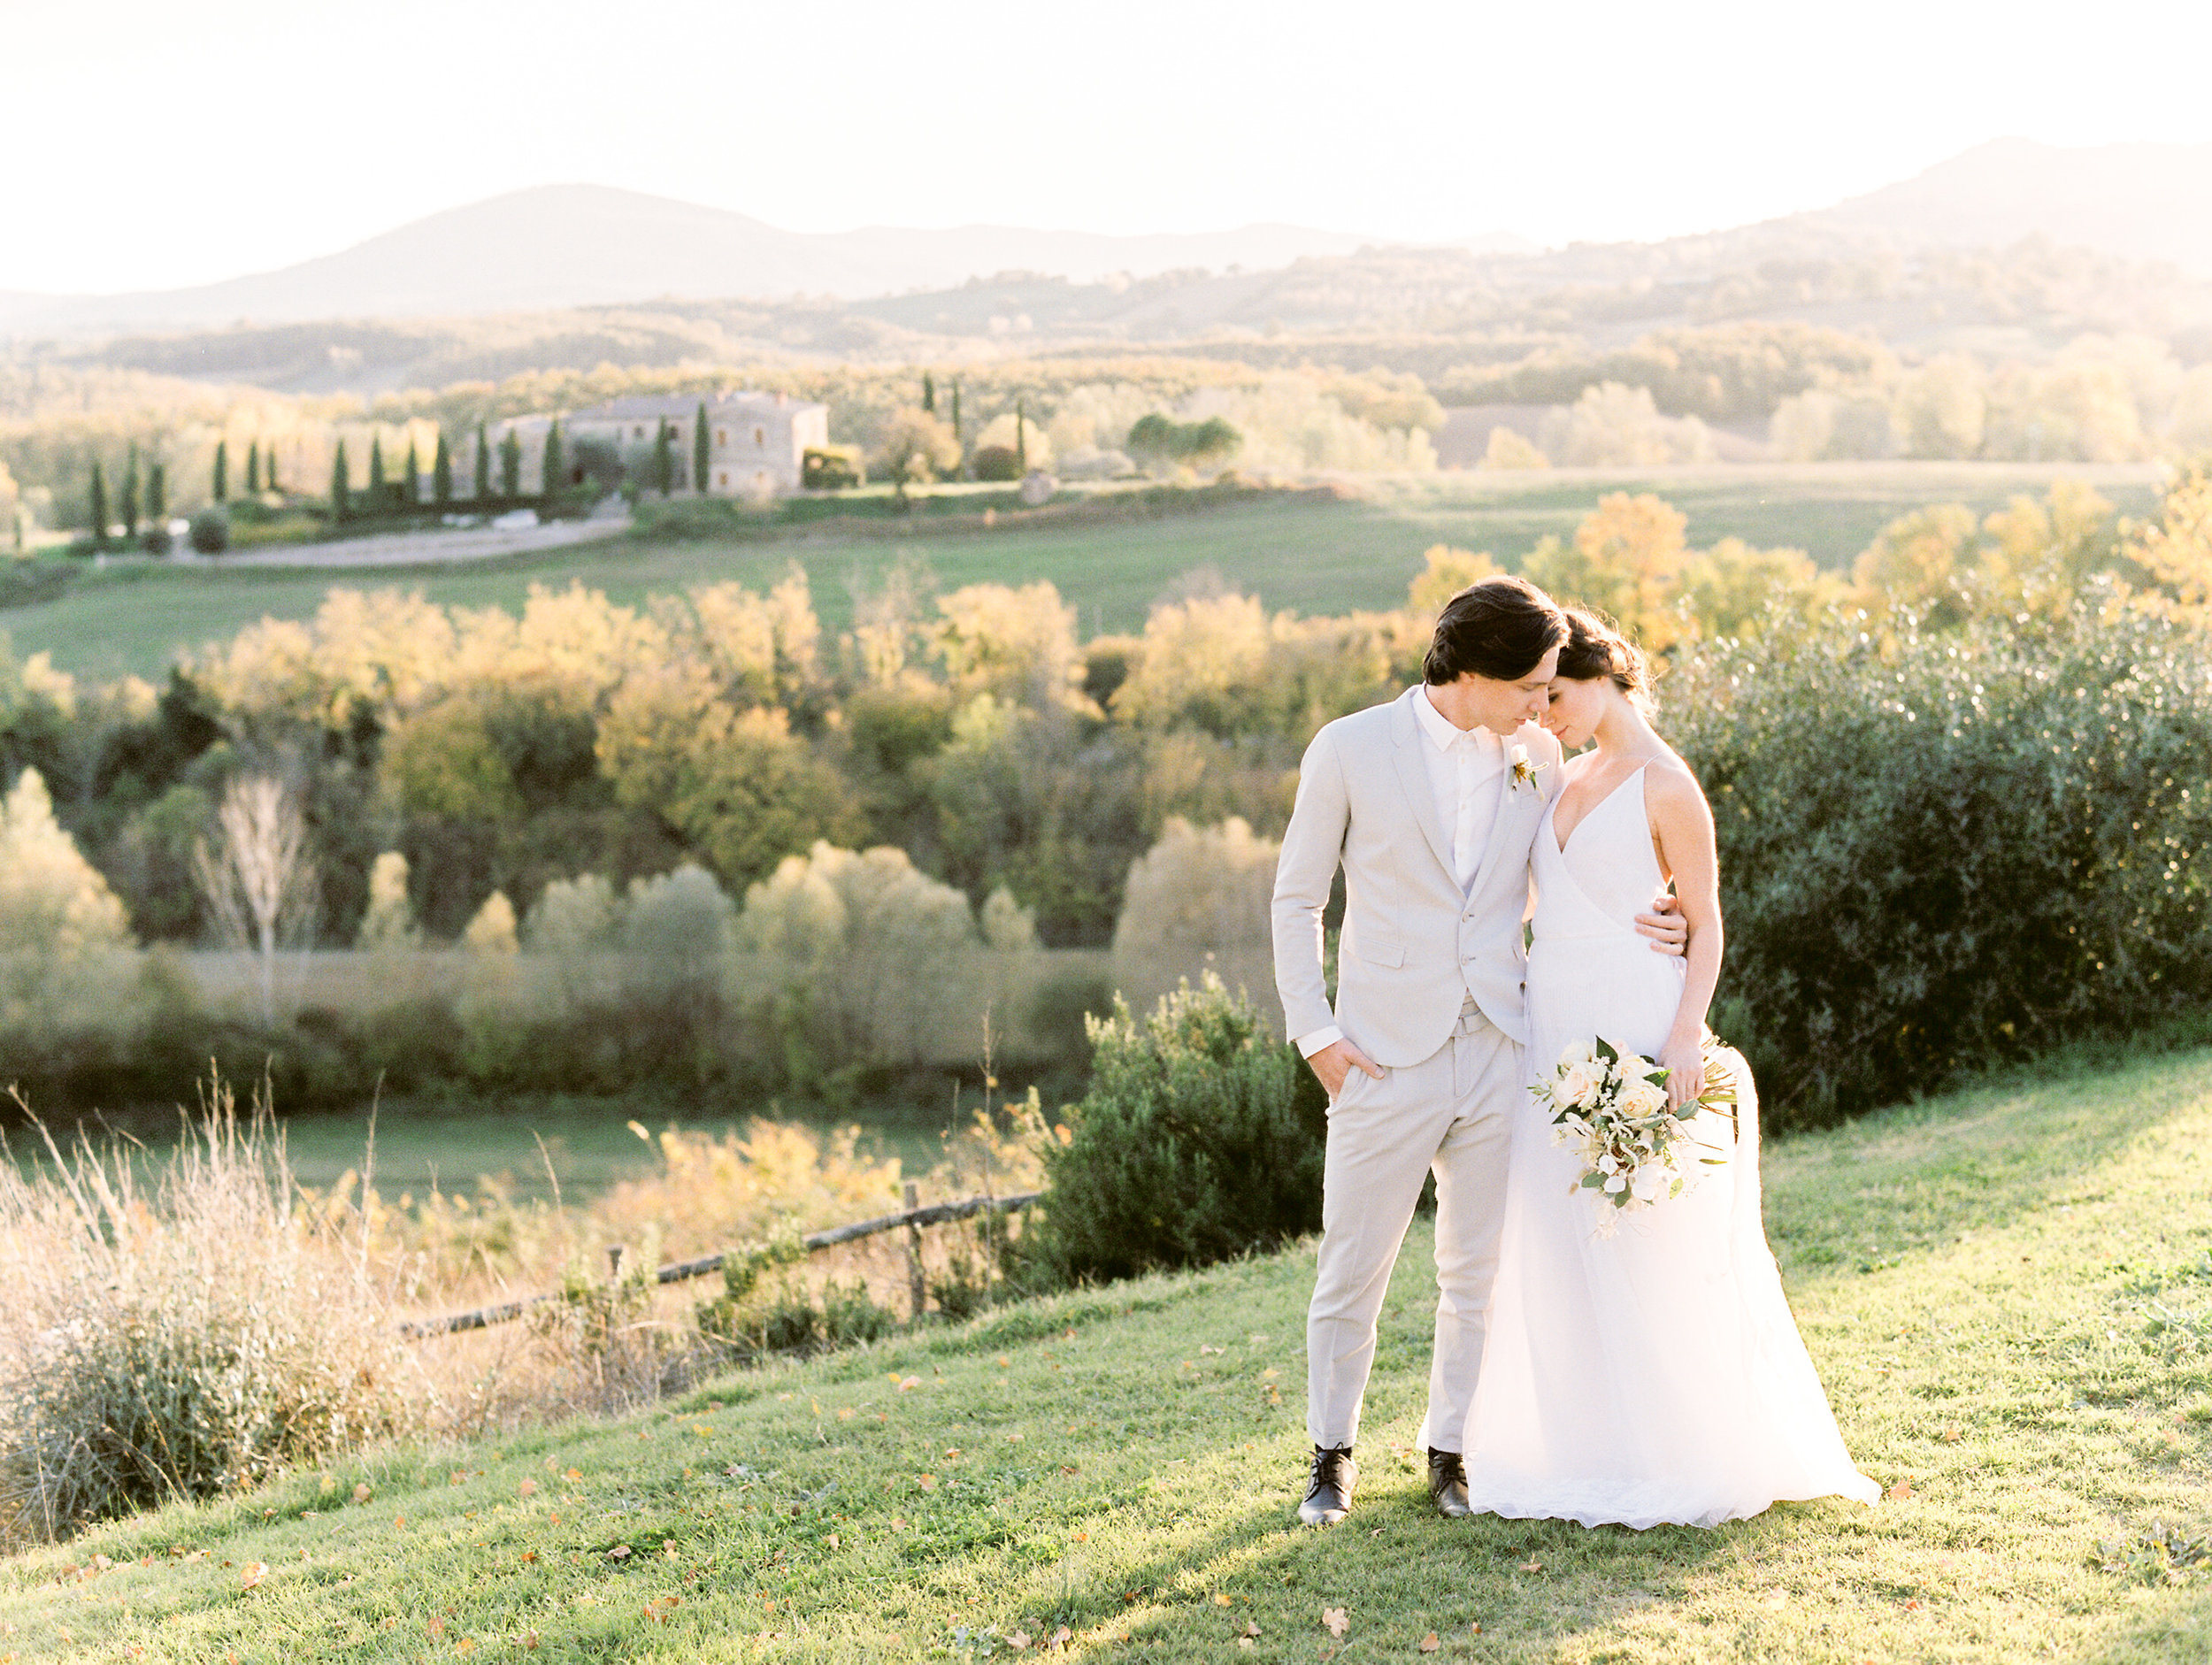 romantic-italy-wedding-in-tuscany-2.jpg